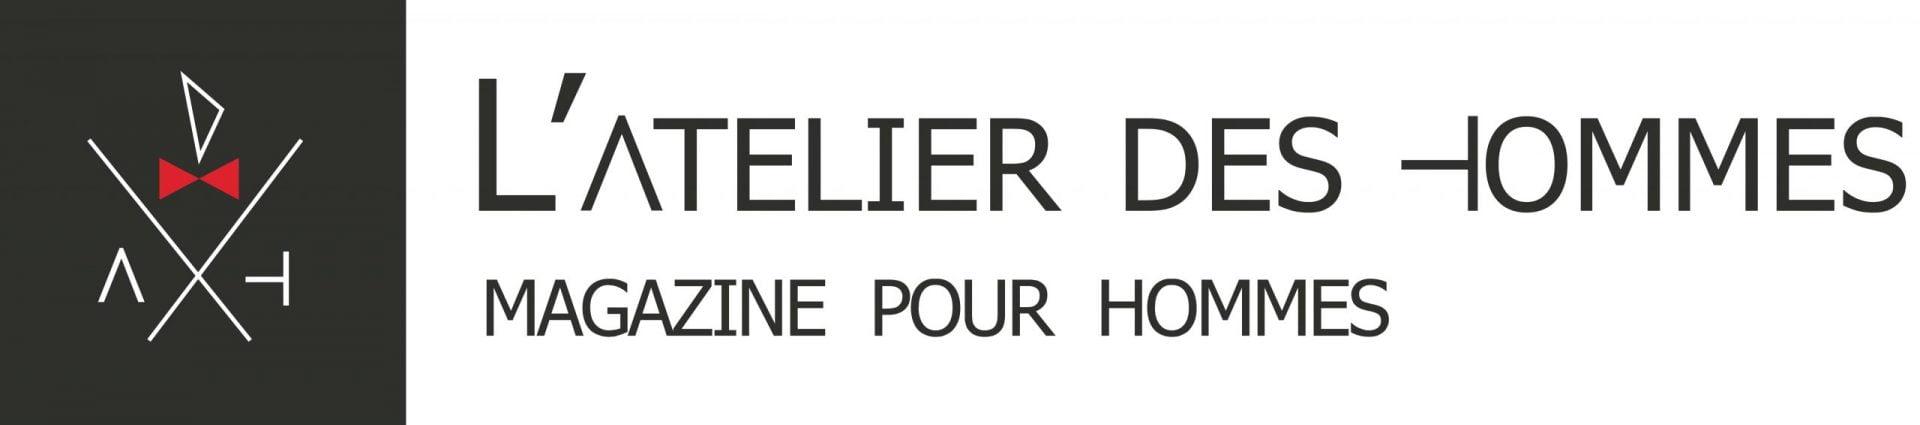 atelierdeshommes.fr